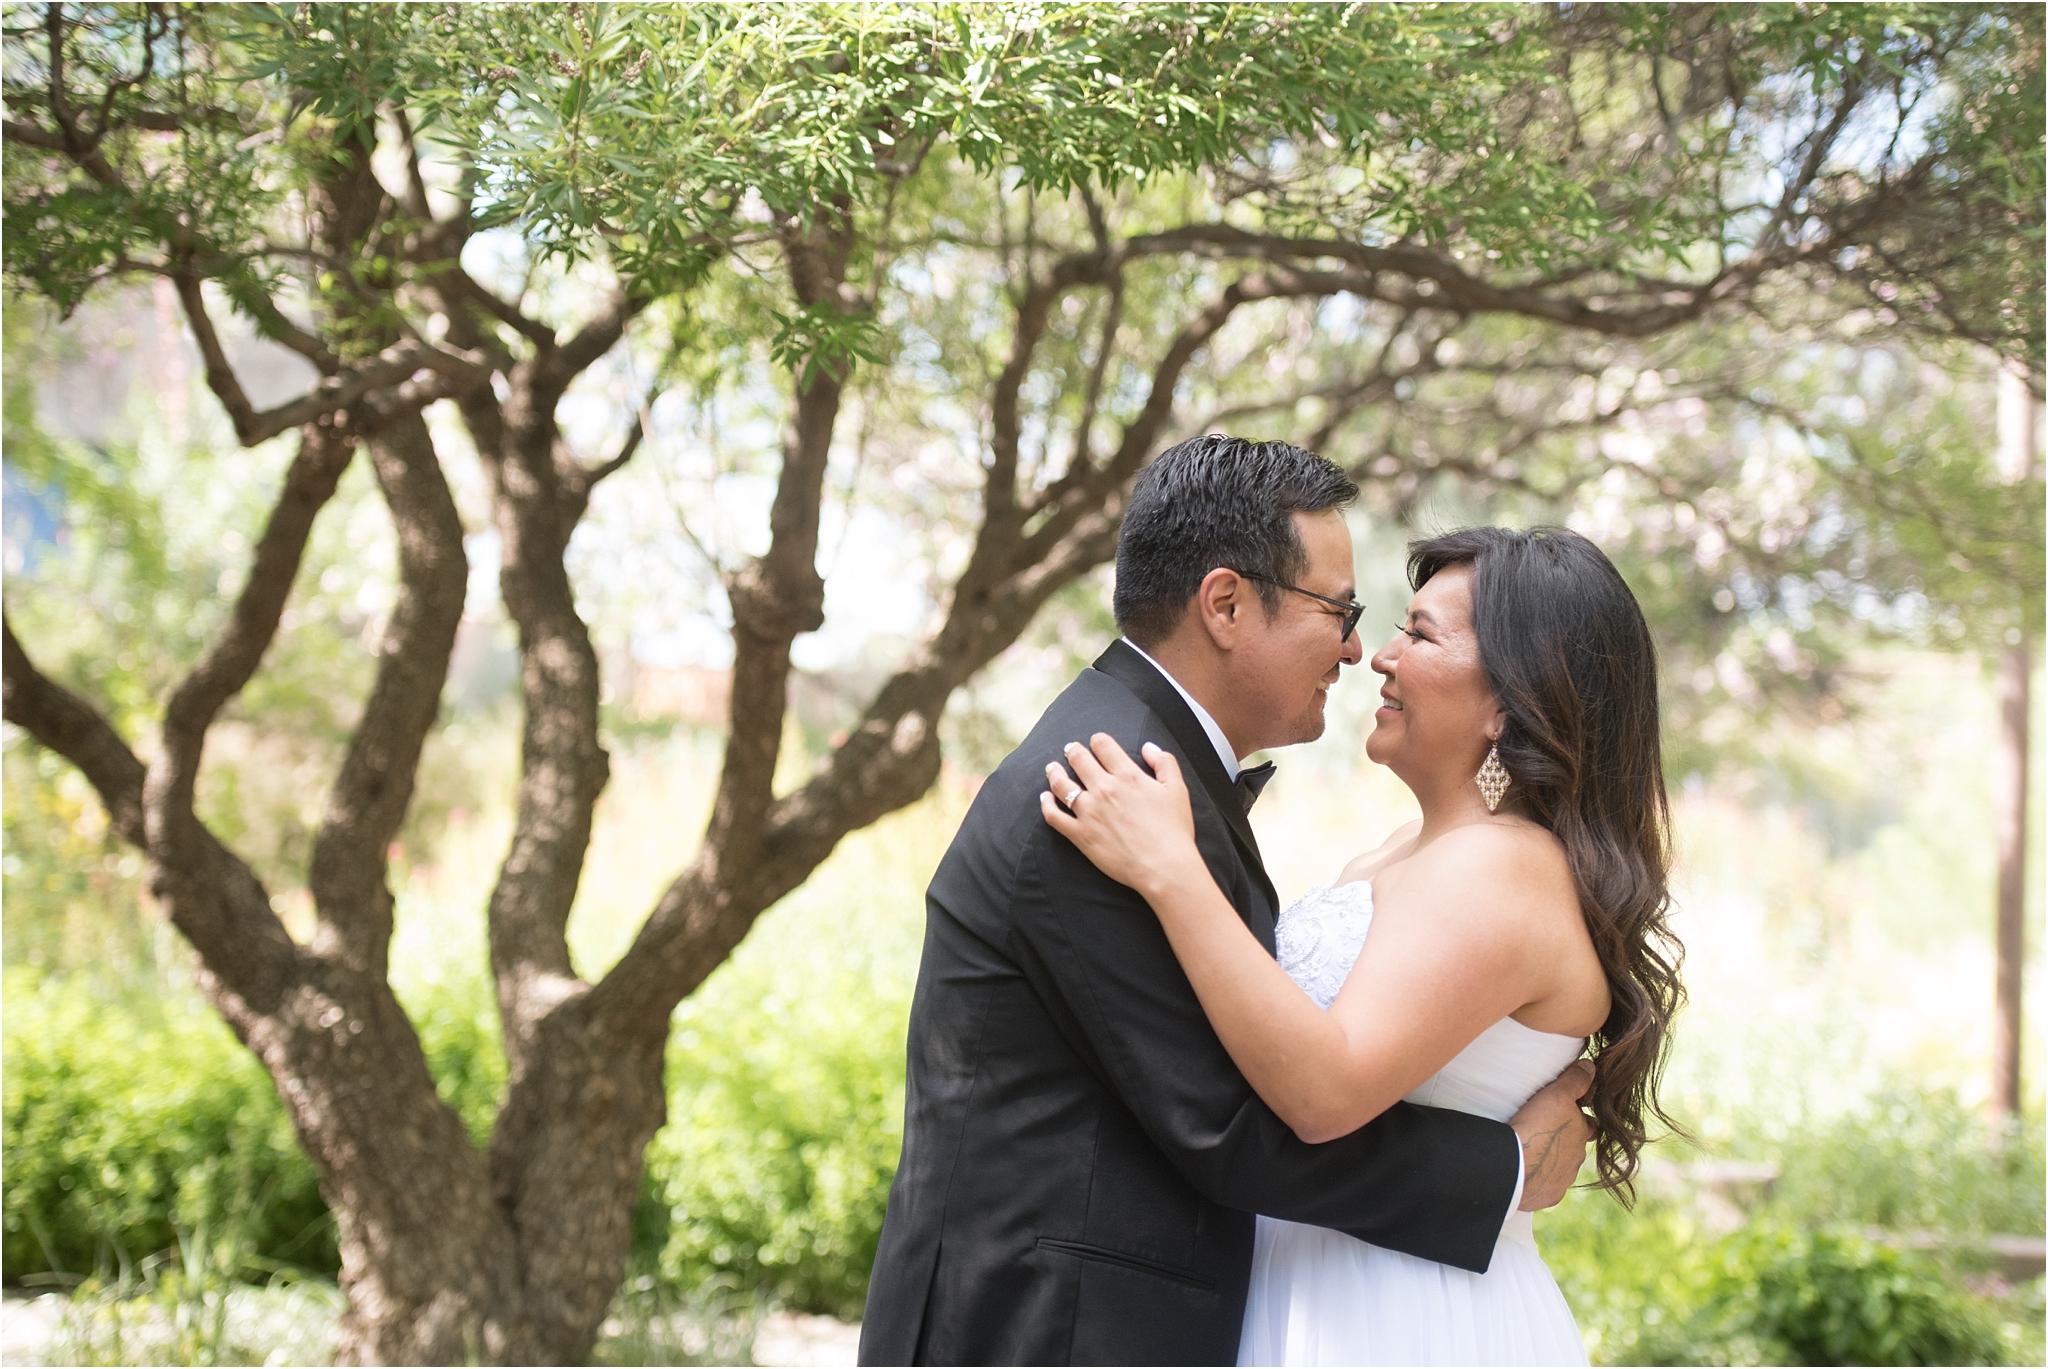 kayla kitts photography - albuquerque botanical gardens - albuquerque wedding photographer - albuquerque wedding - the banque lofts wedding_0013.jpg